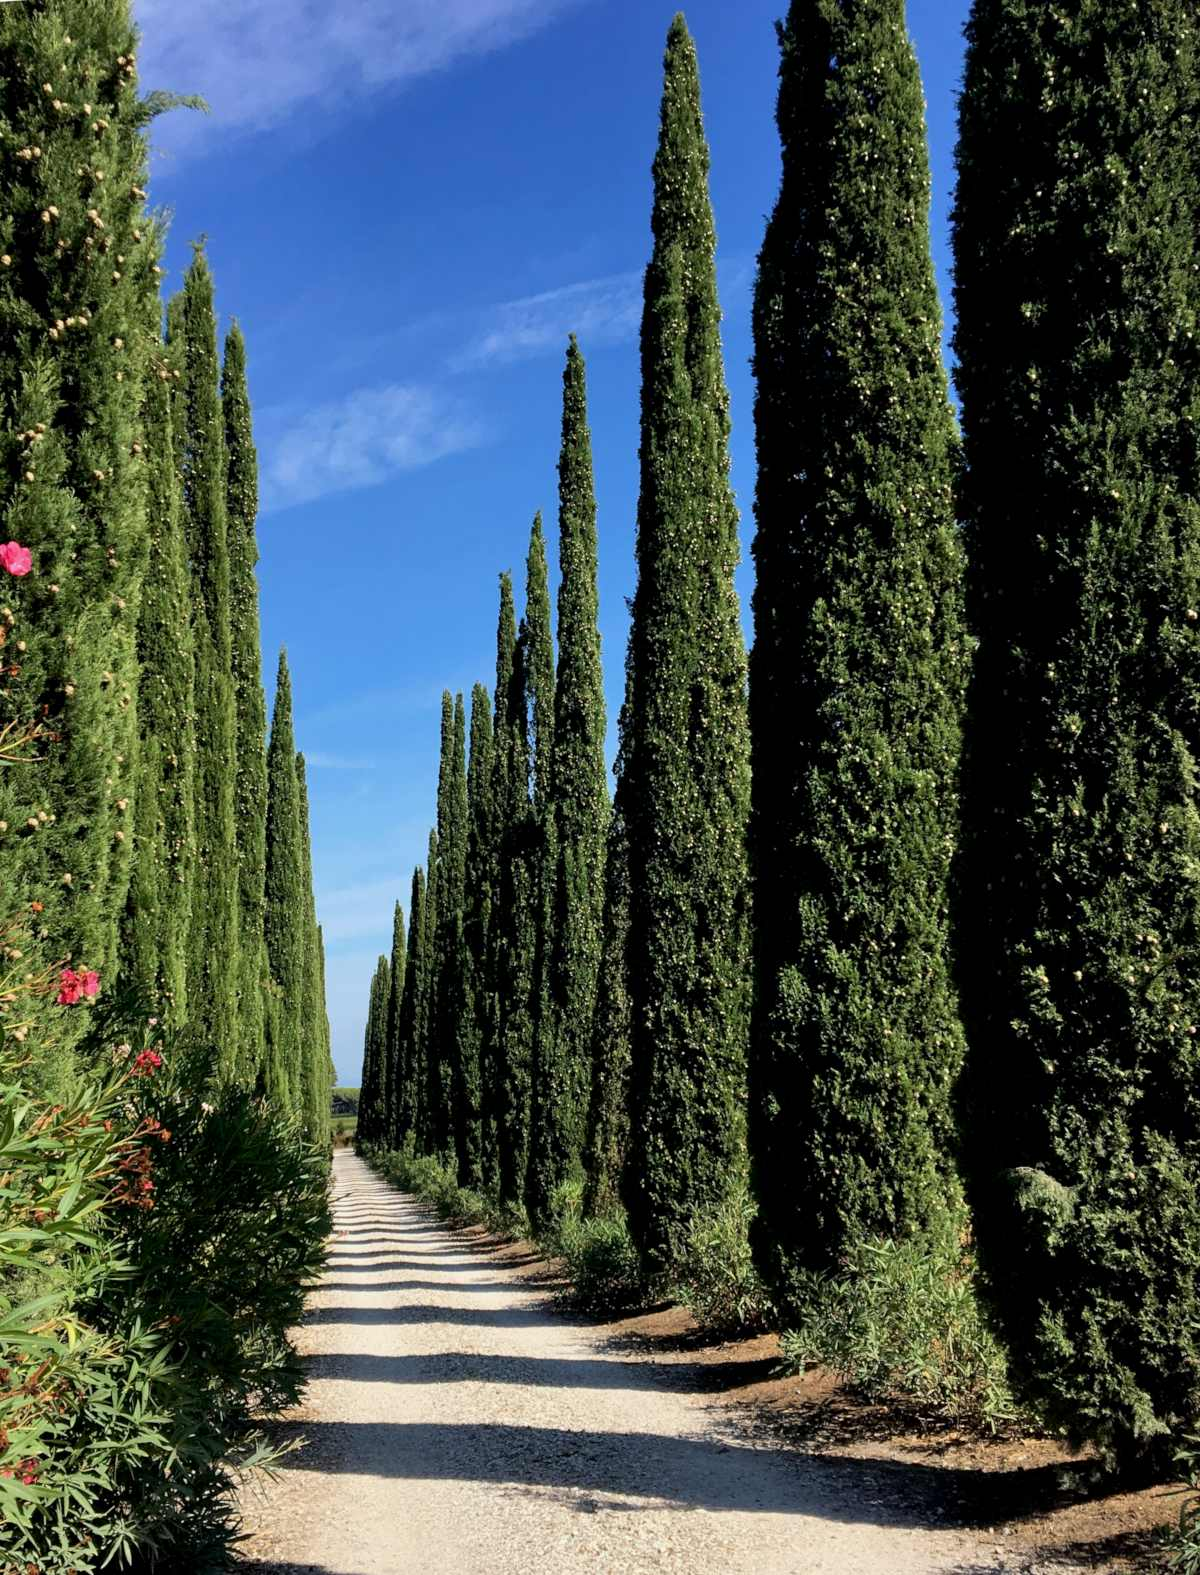 Cypress tree, a superb conifer